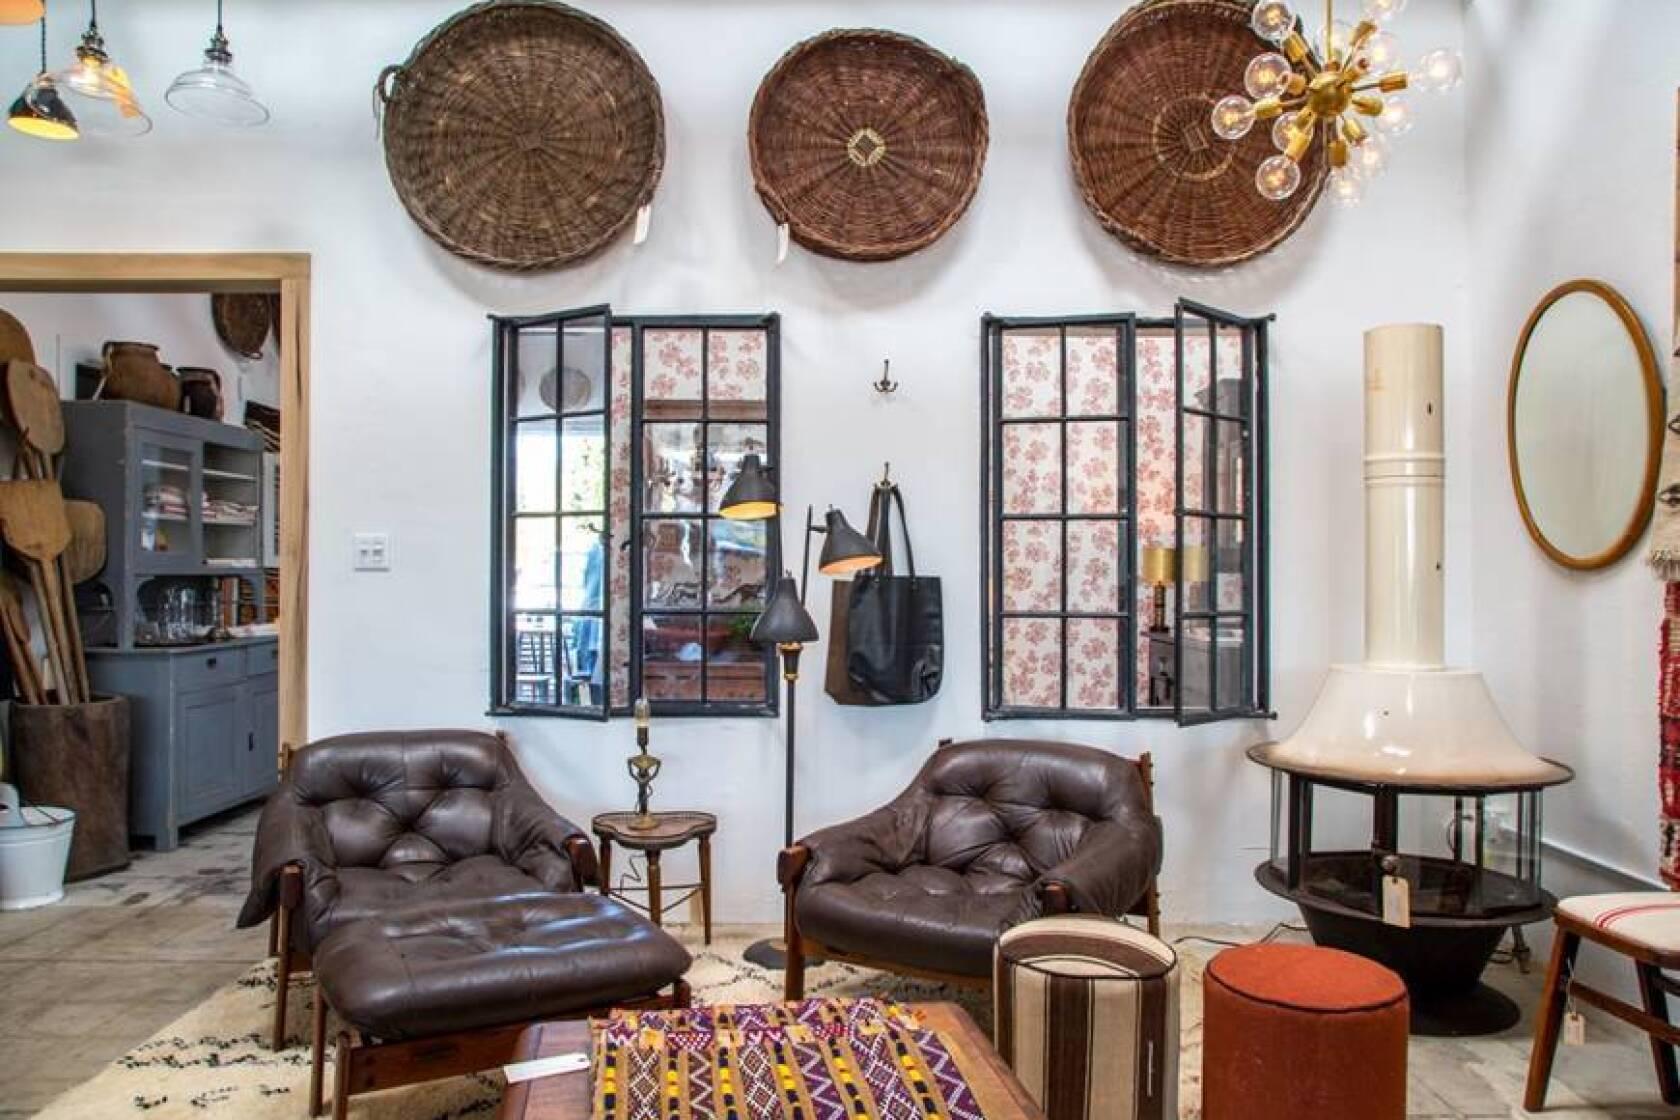 Vintage Modern And More On Display At New Dekor Showroom In